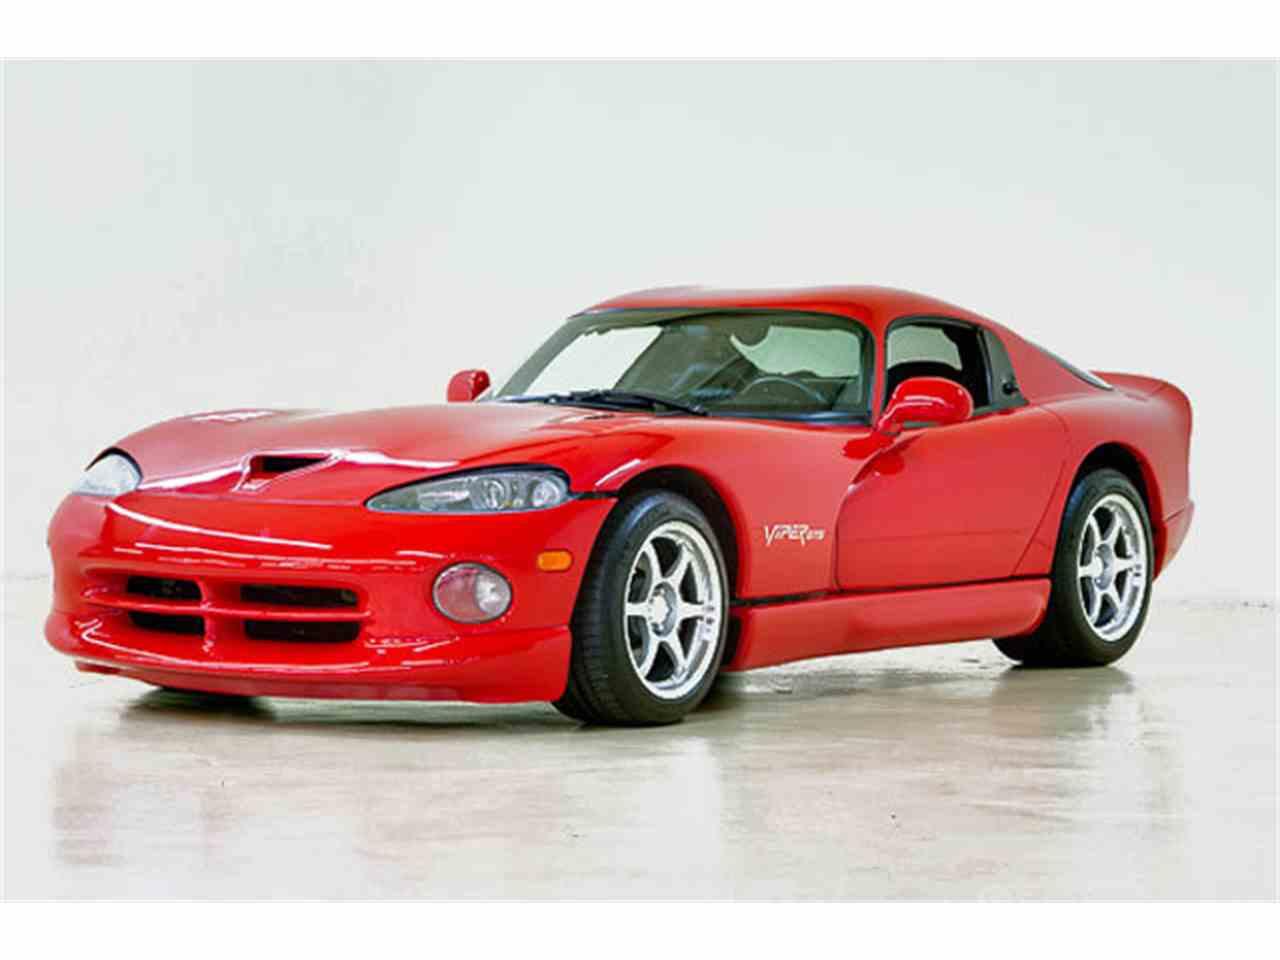 Large Picture of 1997 Dodge Viper located in North Carolina - $44,995.00 - JQ36